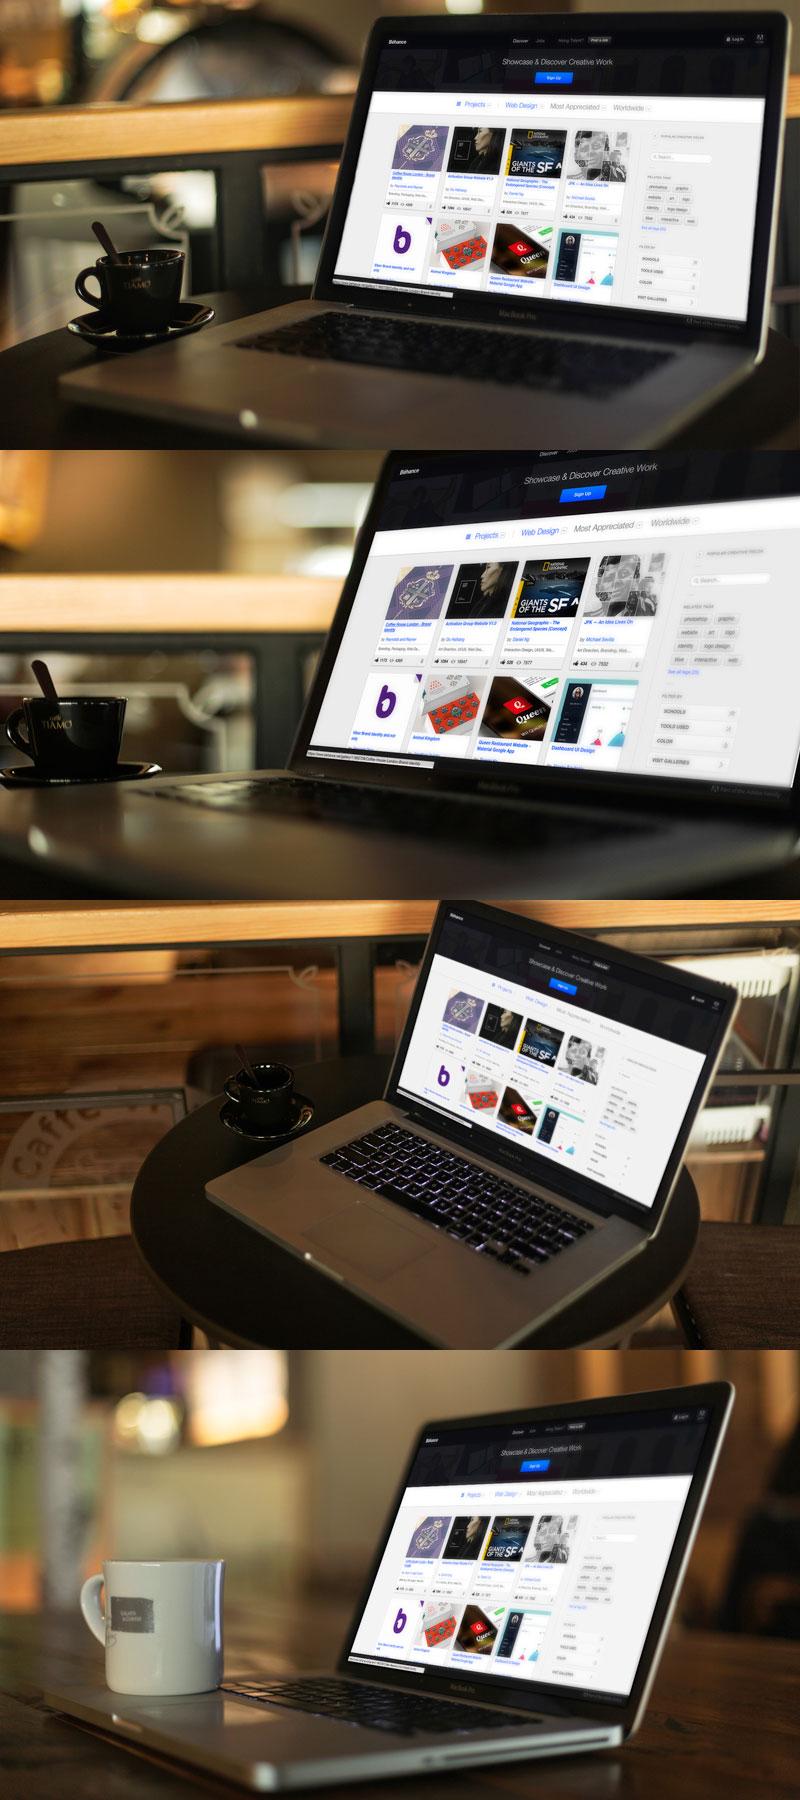 Apple Macbook Pro Indoor Mockup Set  mockup, free mockup, psd mockup, mockup psd, free psd, psd, download mockup, mockup download, photoshop mockup, mock-up, free mock-up, mock-up psd, mockup template, free mockup psd, presentation mockup, branding mockup, free psd mockup